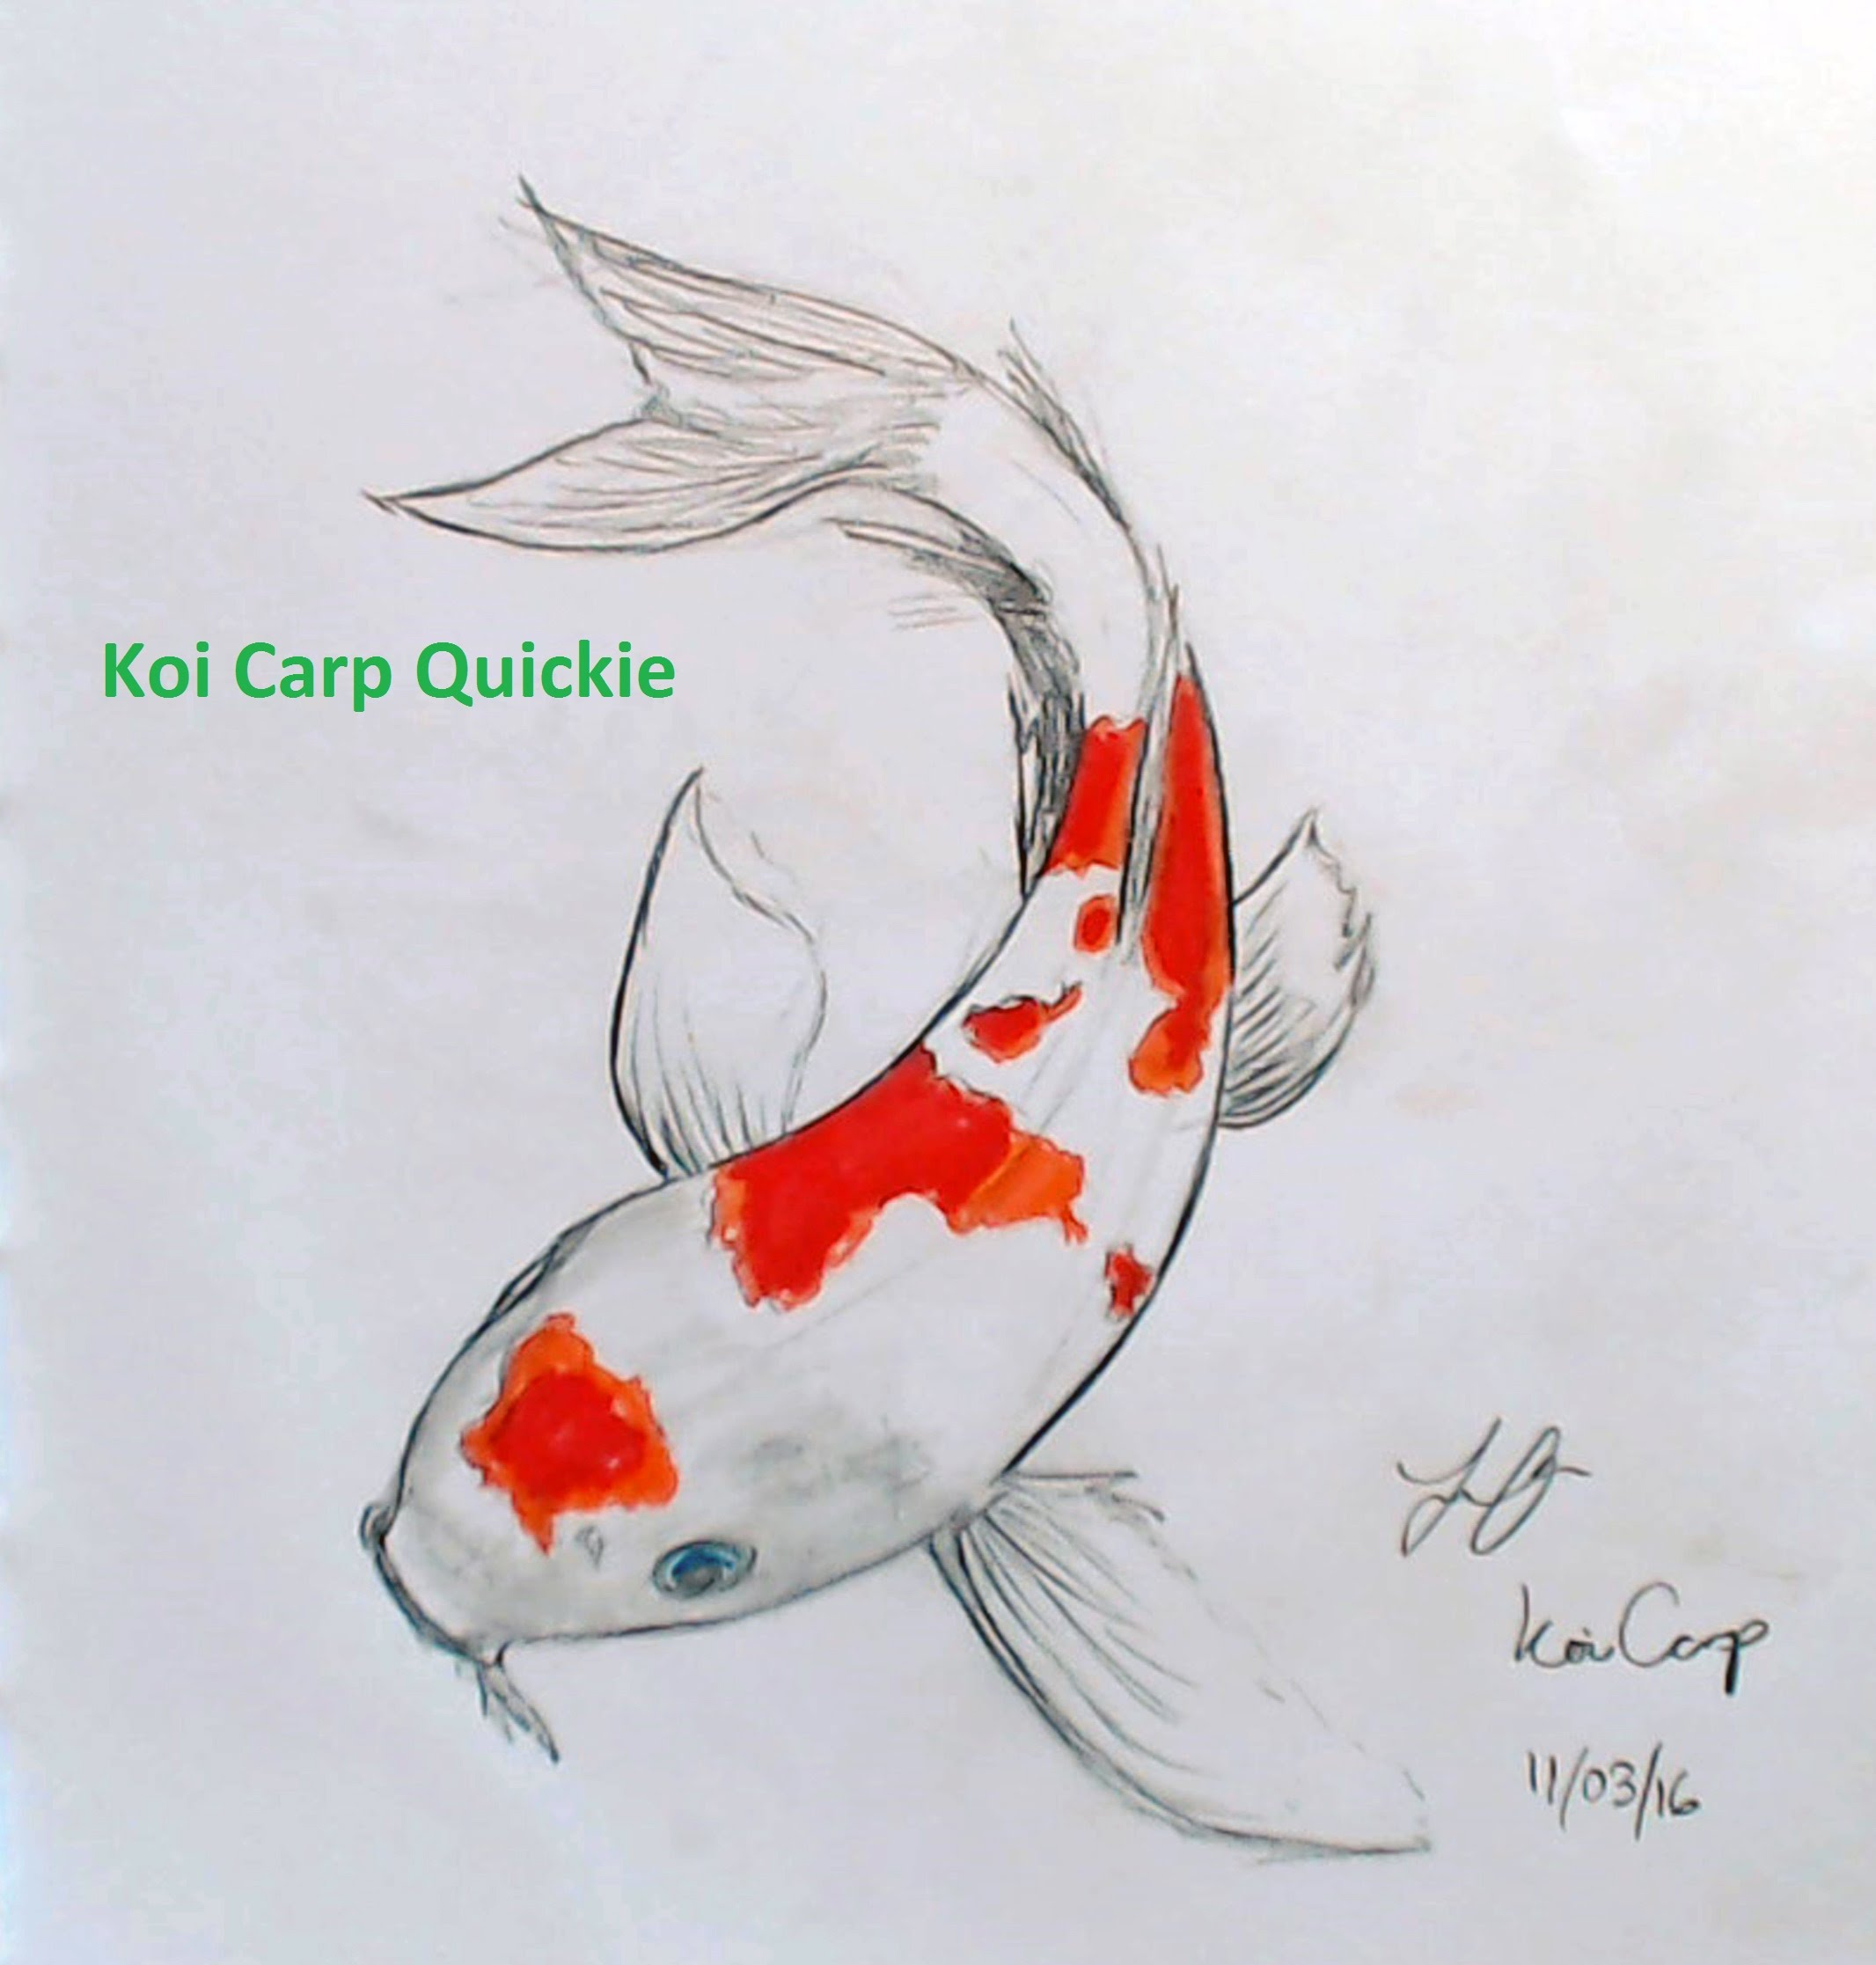 Drawn koi carp #10